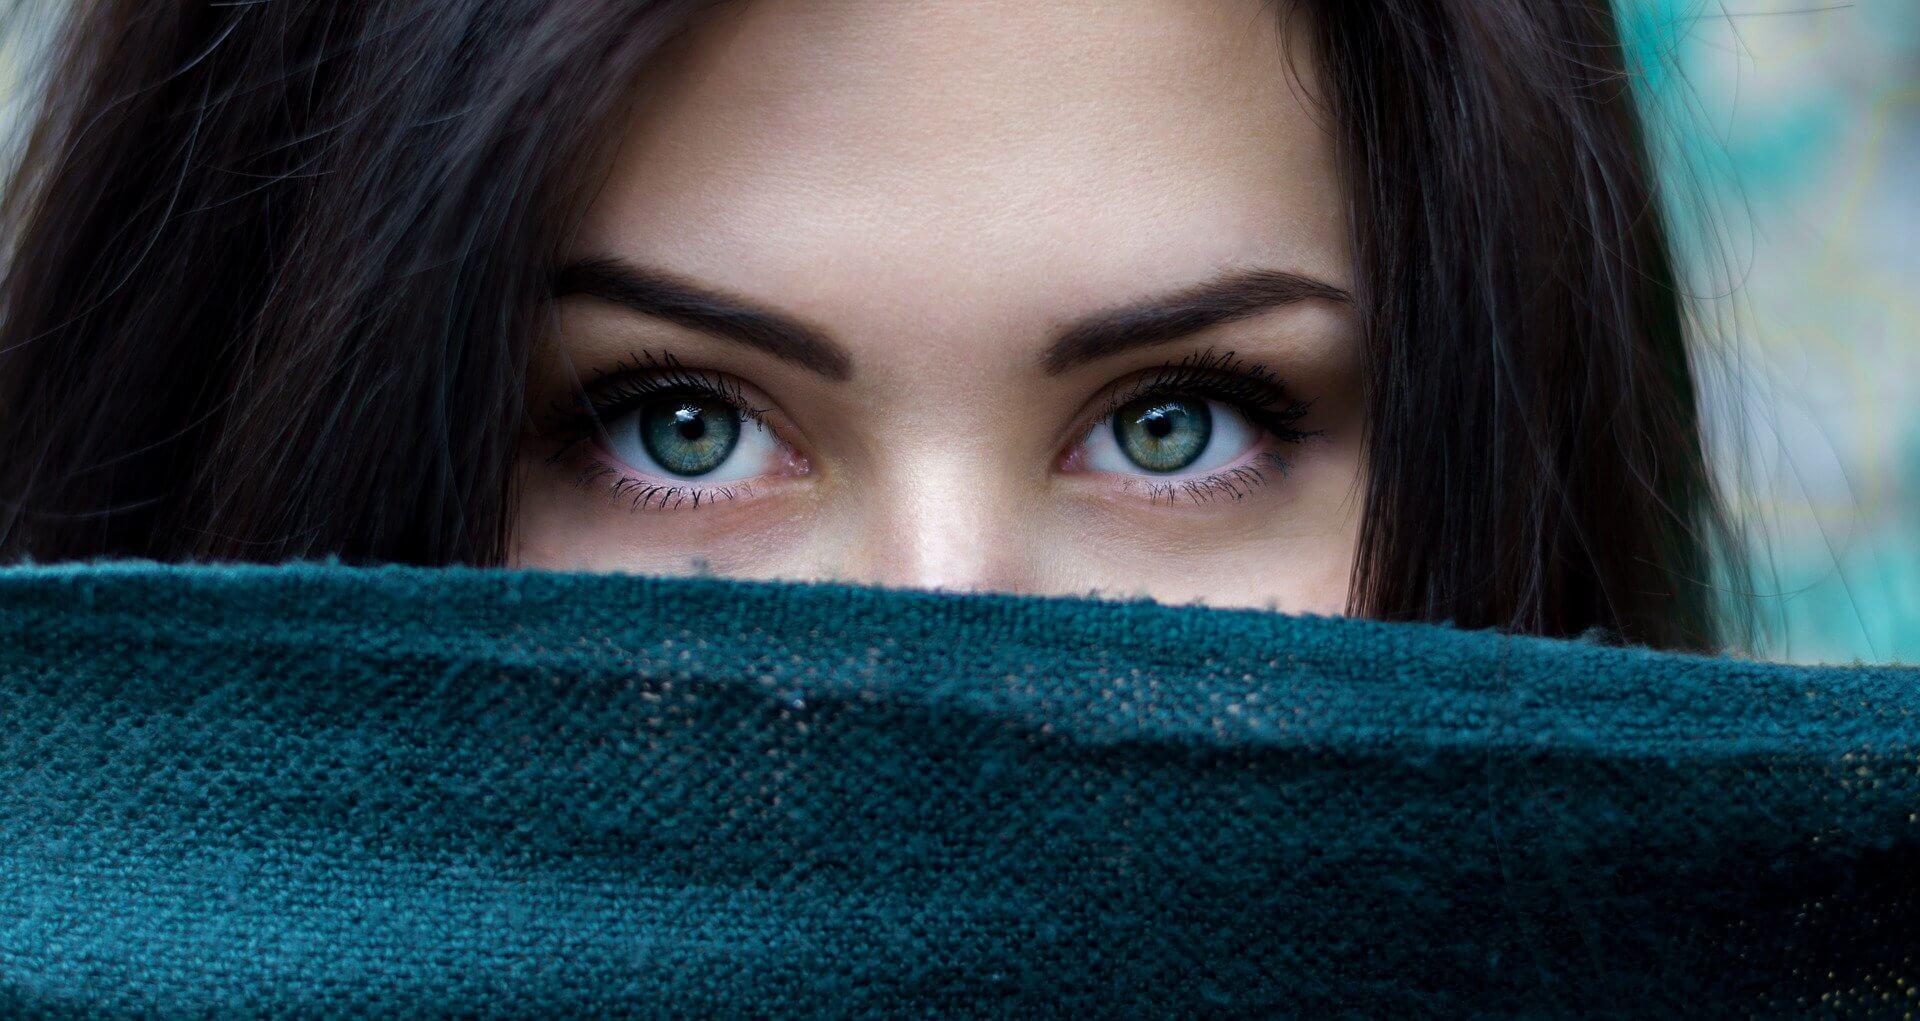 Girl beautiful eyes